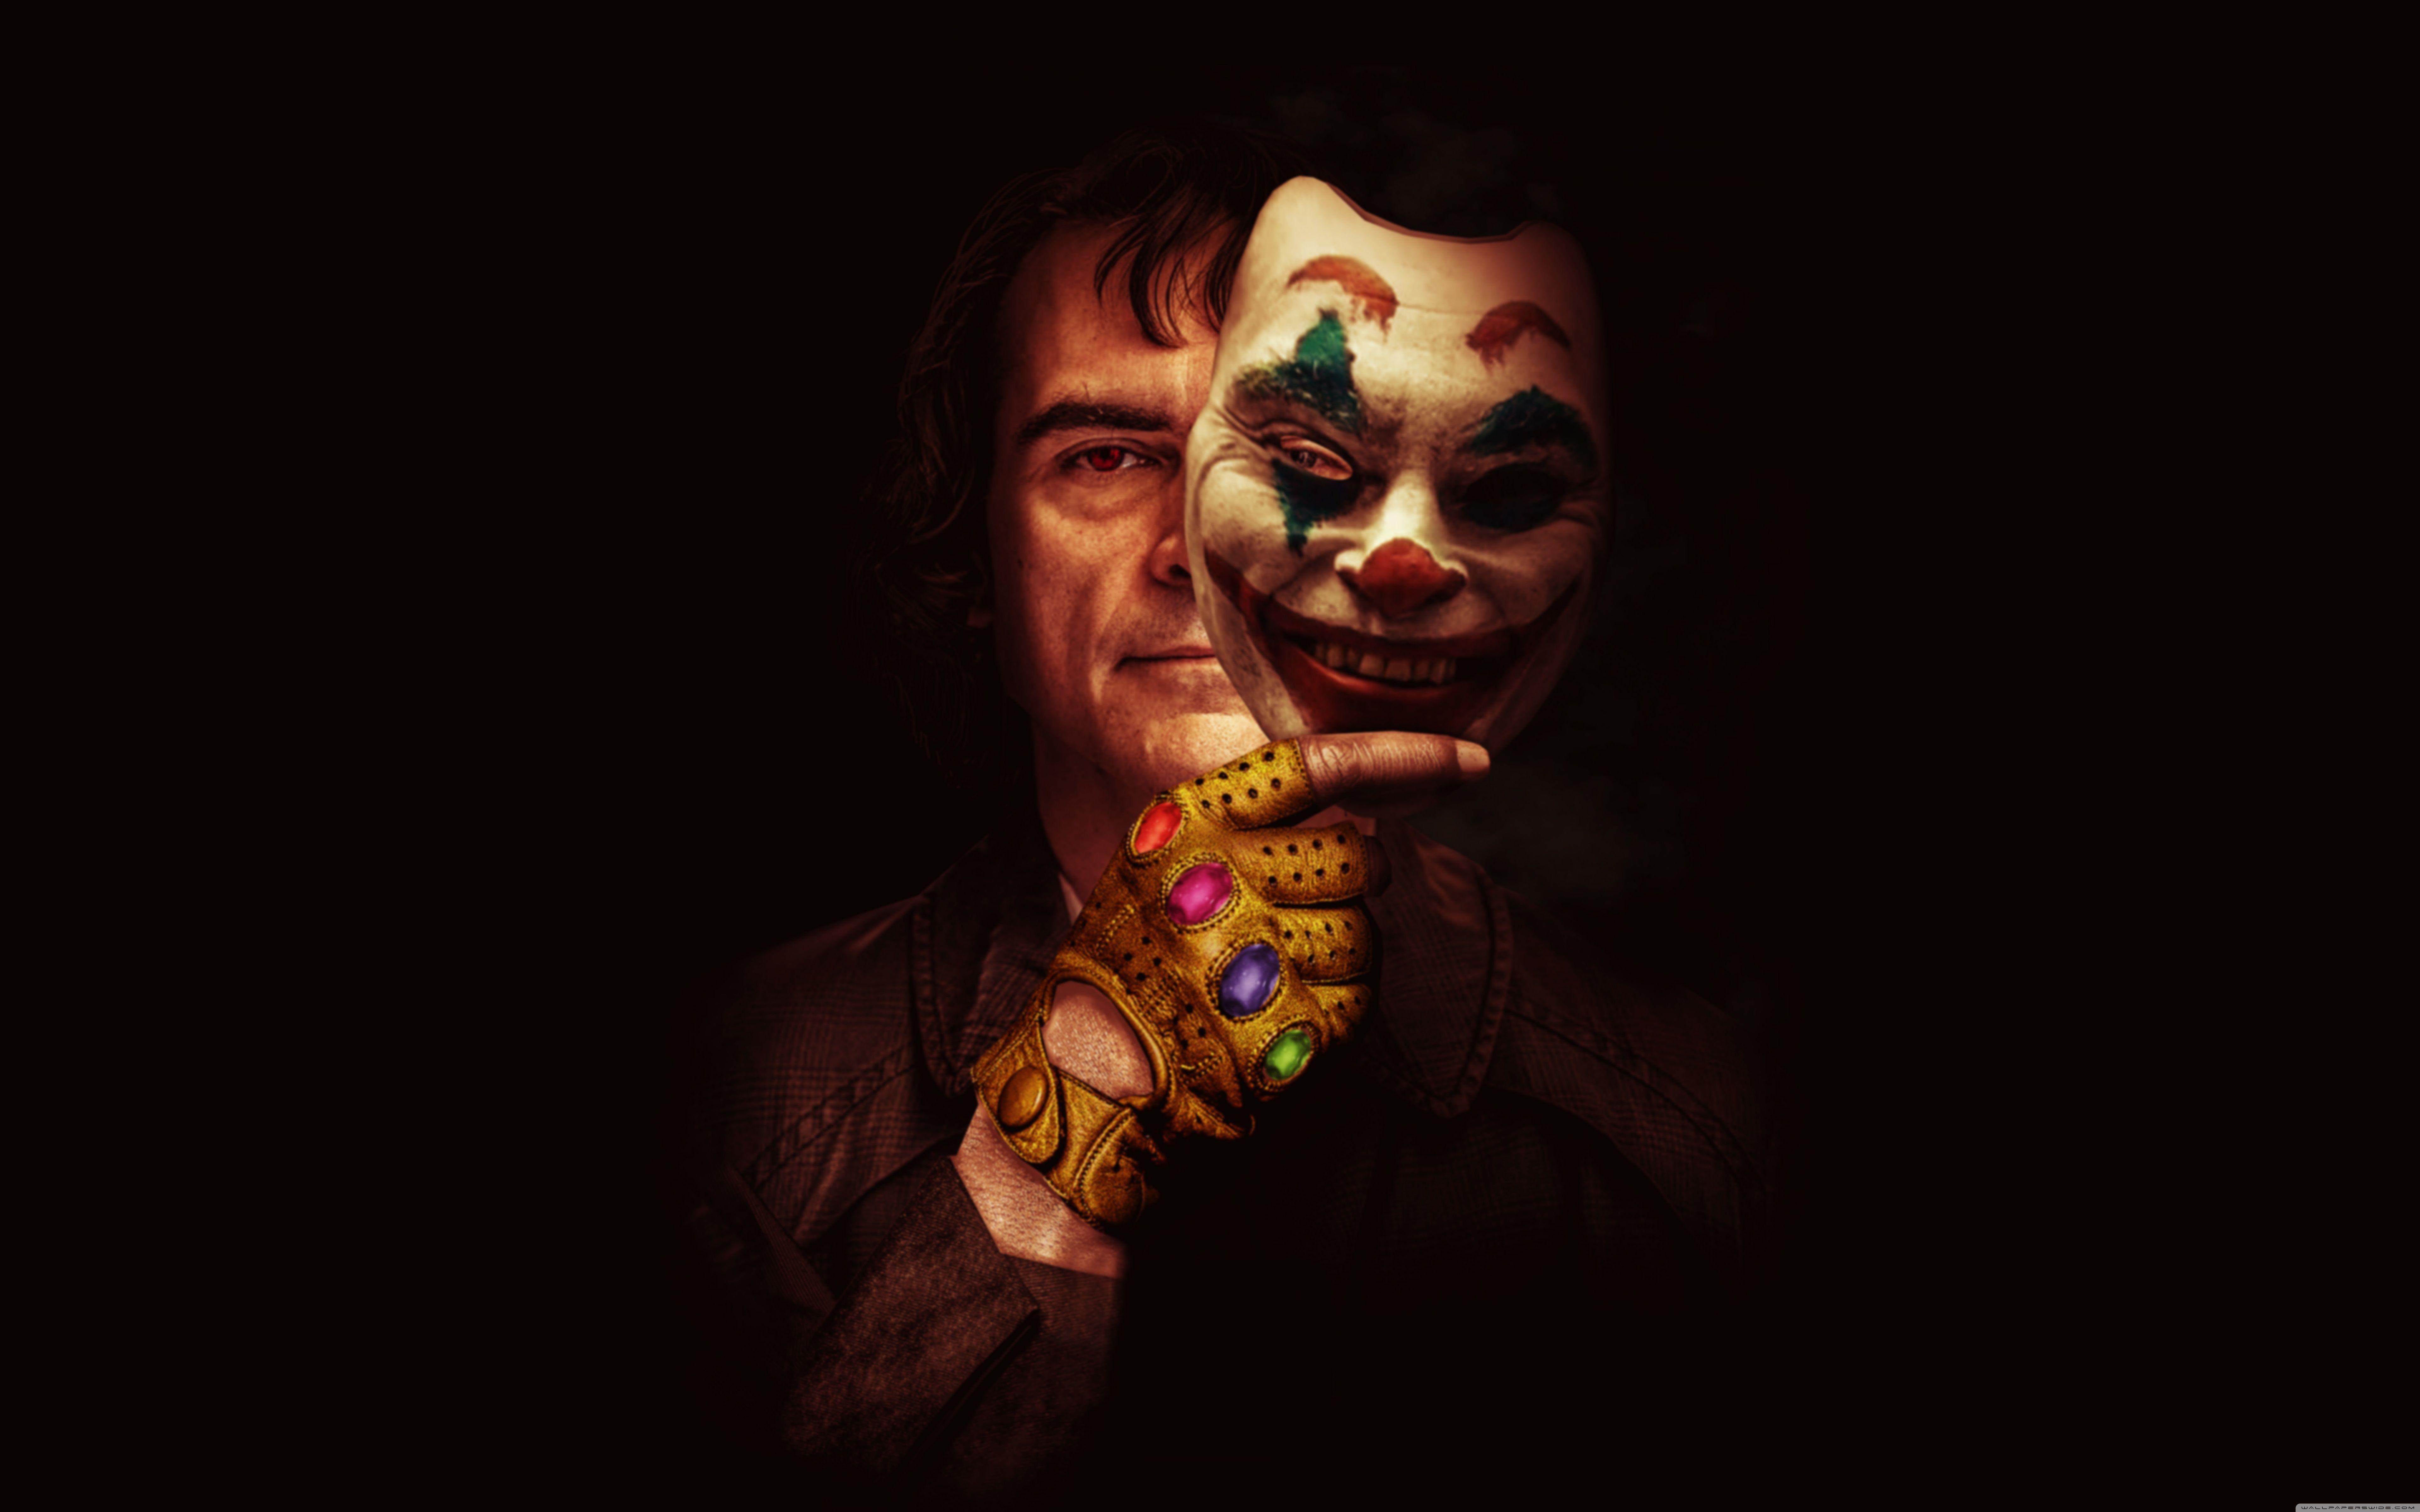 Joker Black Mask Wallpapers Top Free Joker Black Mask Backgrounds Wallpaperaccess